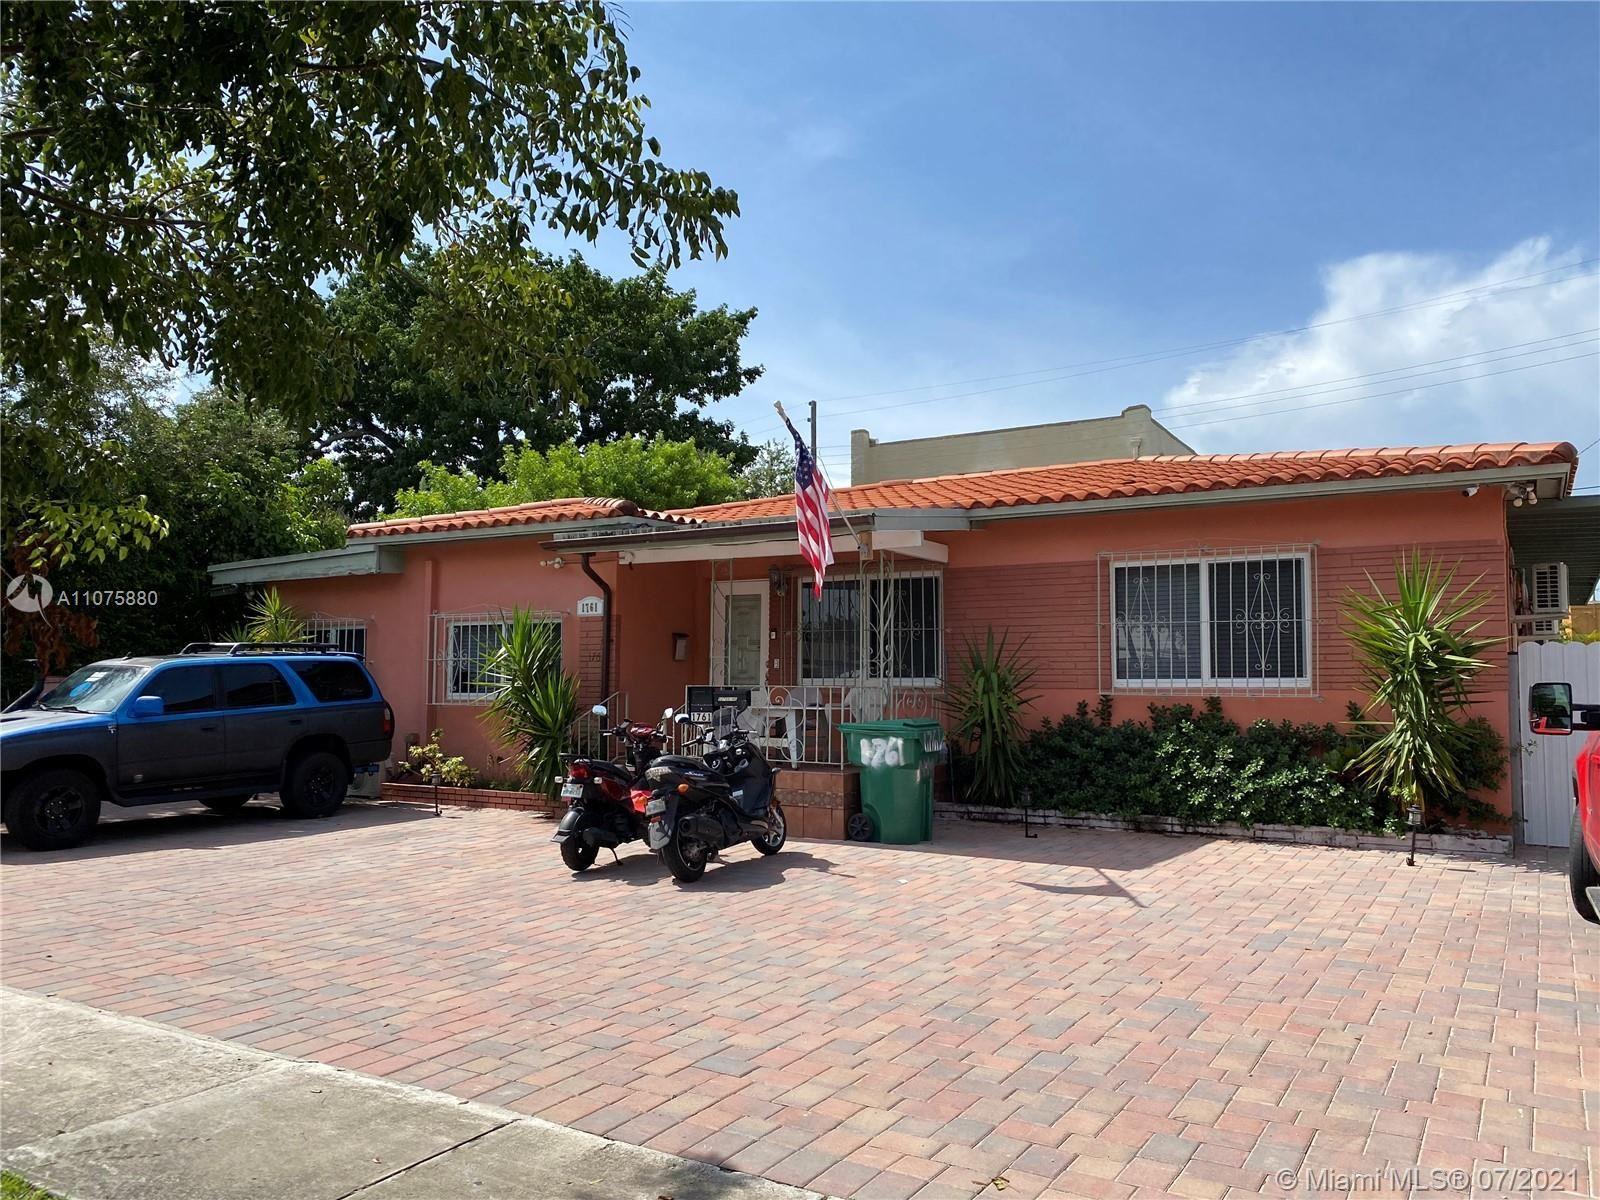 Photo of 1761 SW 14th St, Miami, FL 33145 (MLS # A11075880)